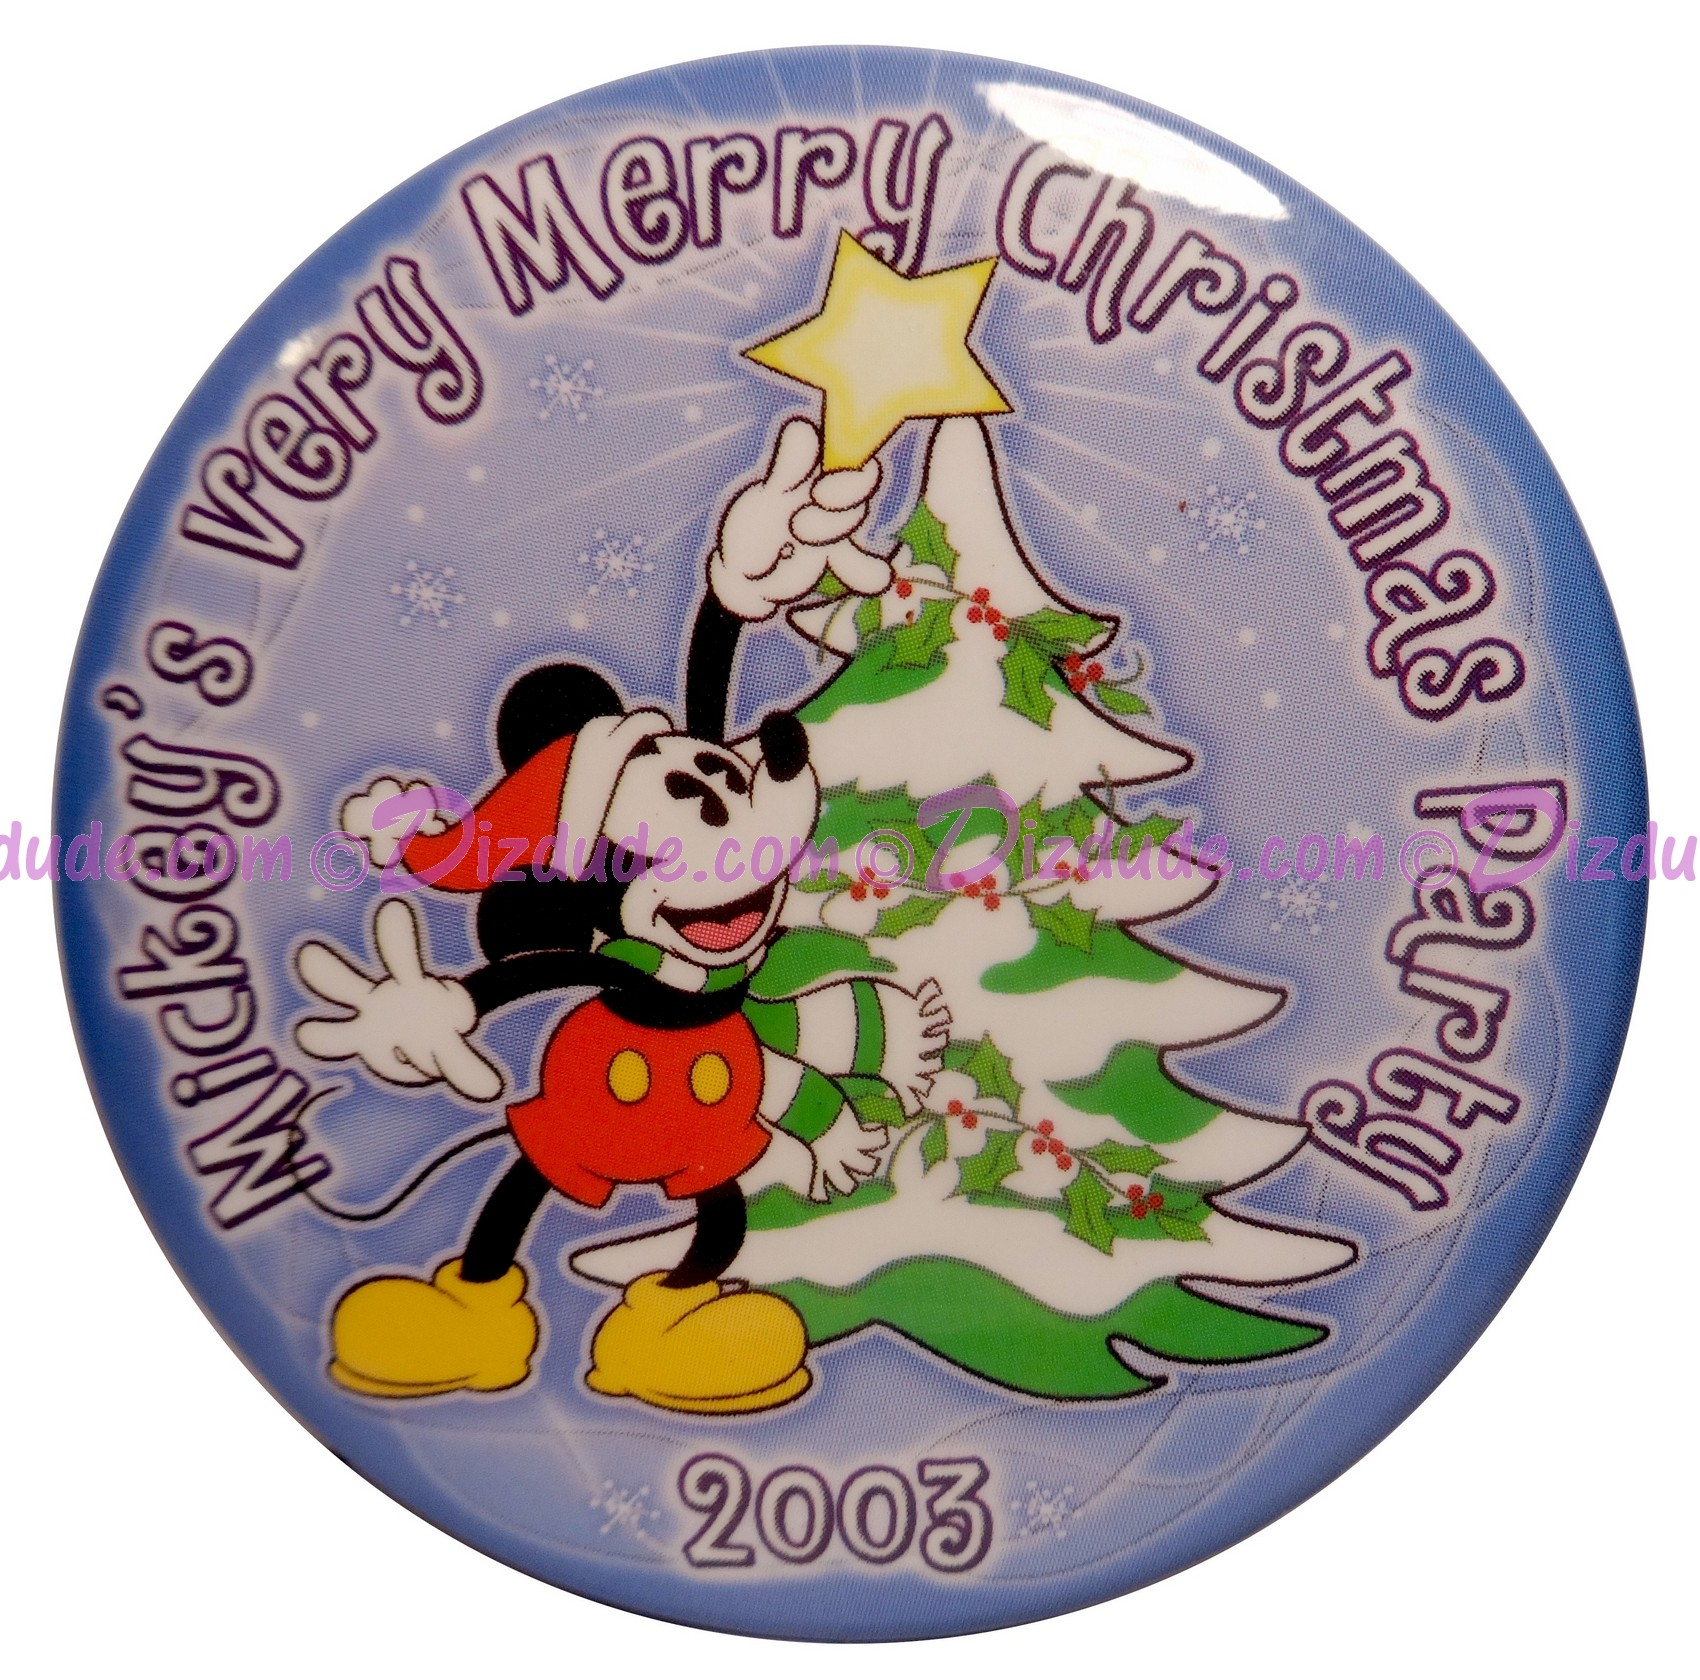 Walt Disney World Mickey's Very Merry Christmas Party 2003 Button © Dizdude.com